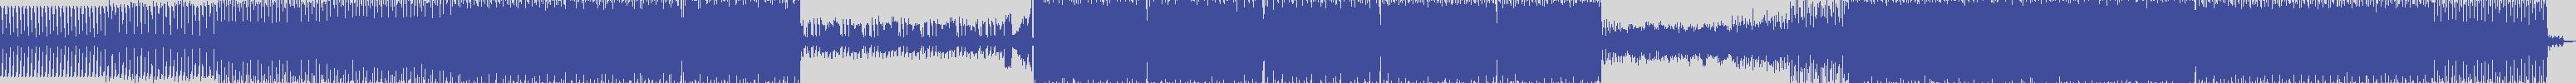 just_digital_records [JS1143] Homeboyz - Future [Mental Tribe Mix] audio wave form